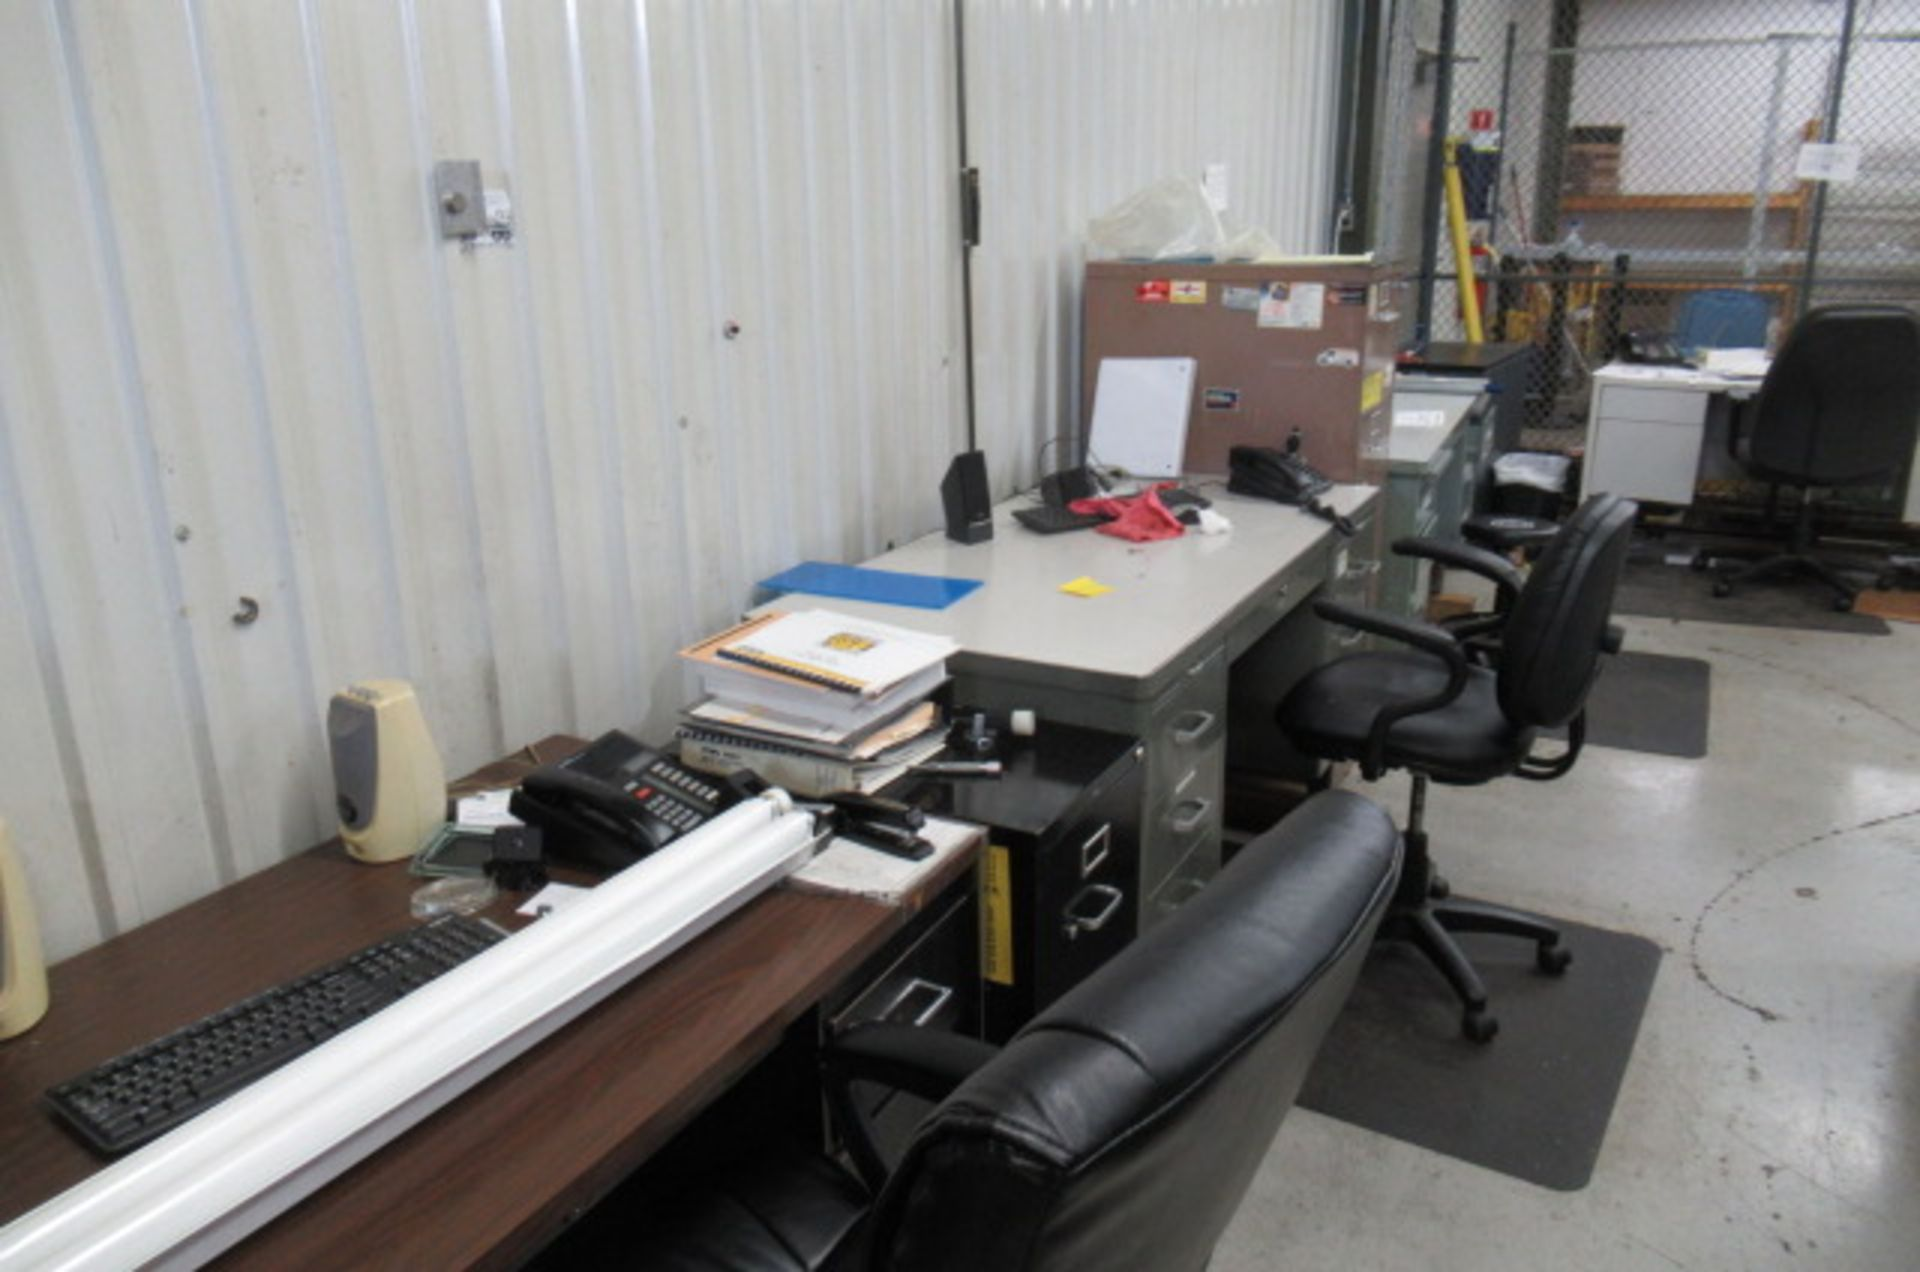 parts cage area 6 desks, 3 file cabinets, 2 Dell monitors, 3 key boards - Image 2 of 4